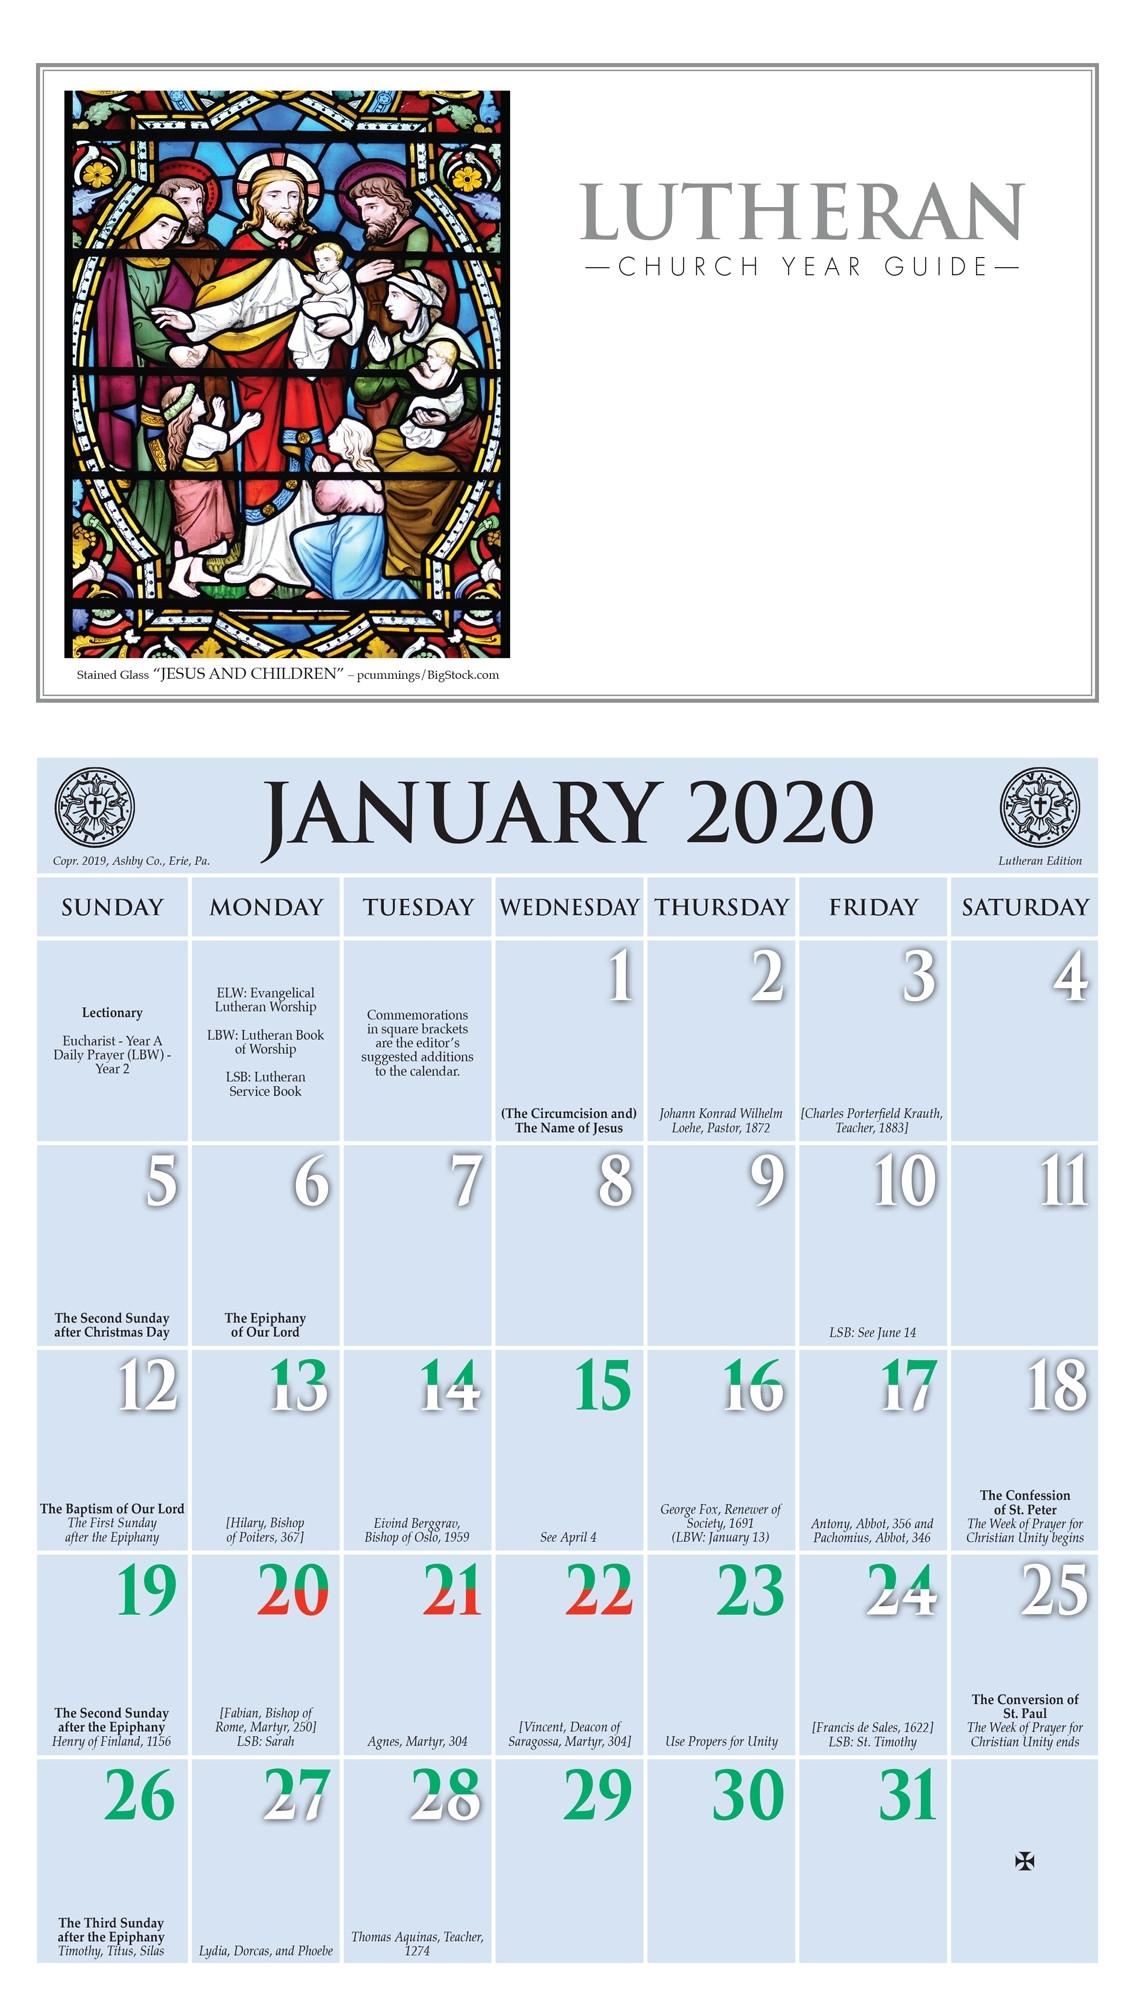 Free Liturgical Church Calendar For 2020 - Calendar  Liturgical Calendar Um Church